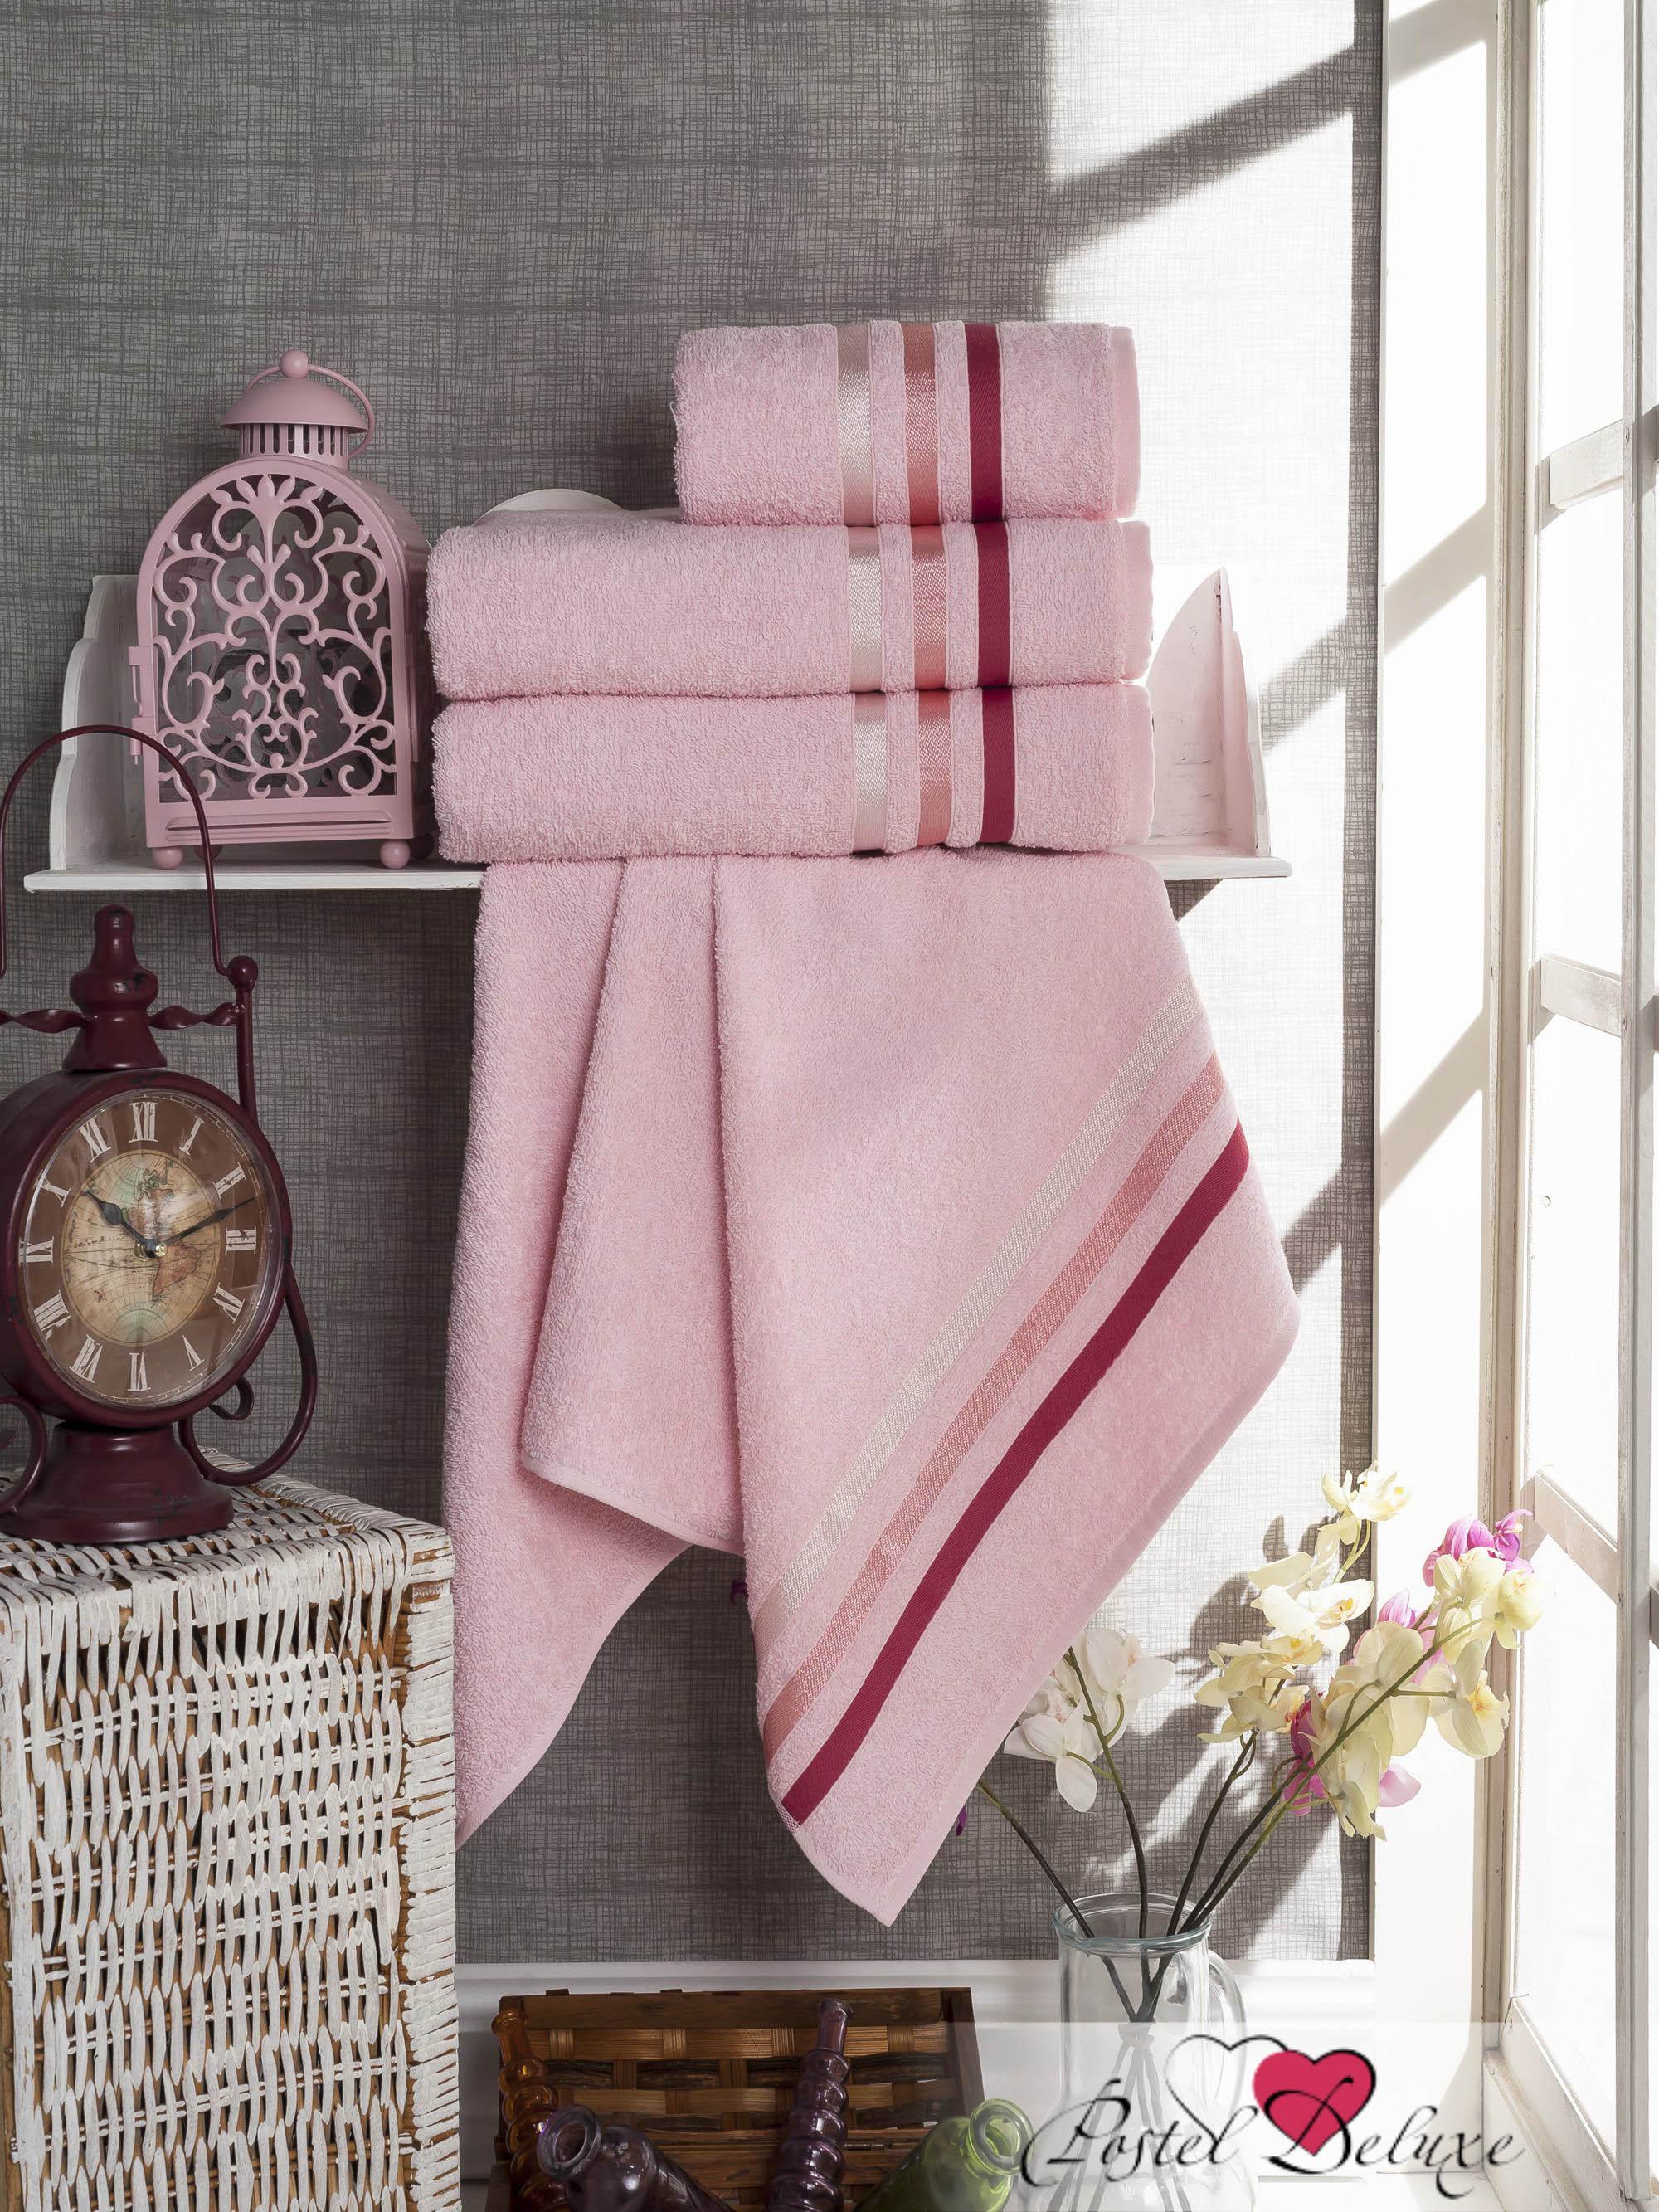 Полотенца Sokuculer Набор Полотенец Vevien Цвет: Розовый набор из 3 полотенец merzuka sakura 50х90 2 70х140 8432 оранжевый